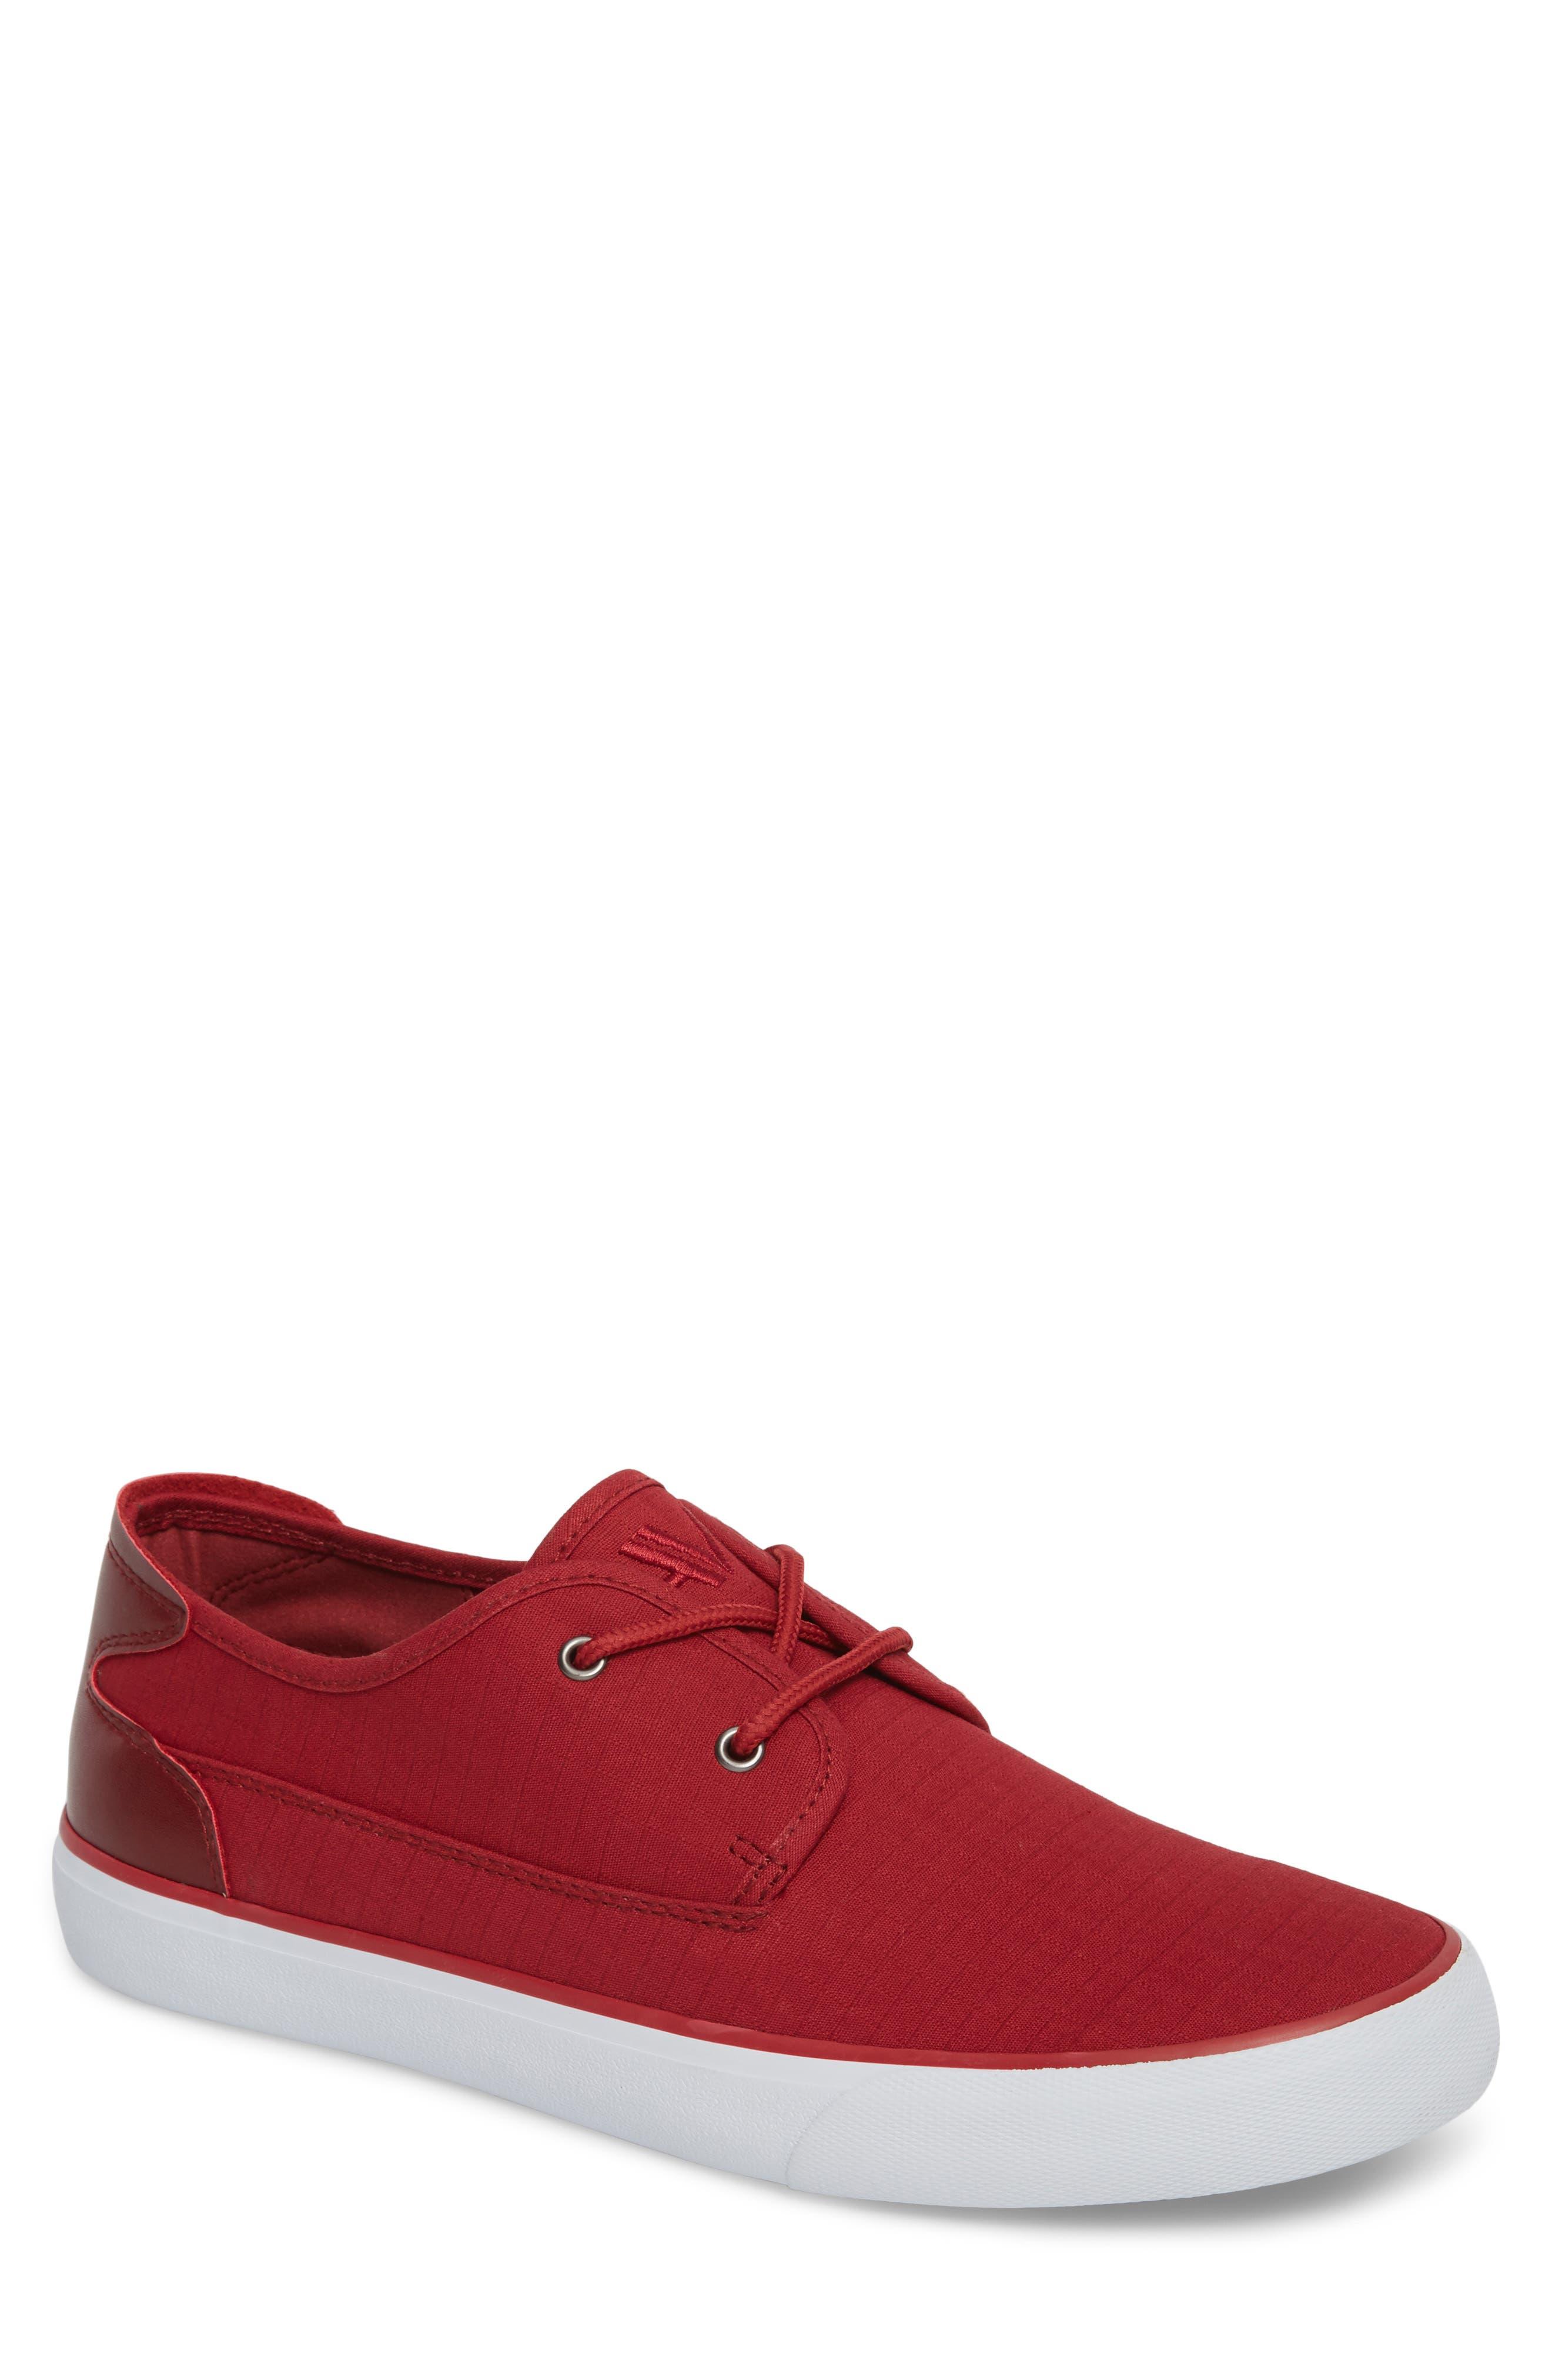 Morris Sneaker,                         Main,                         color, RED/ WHITE